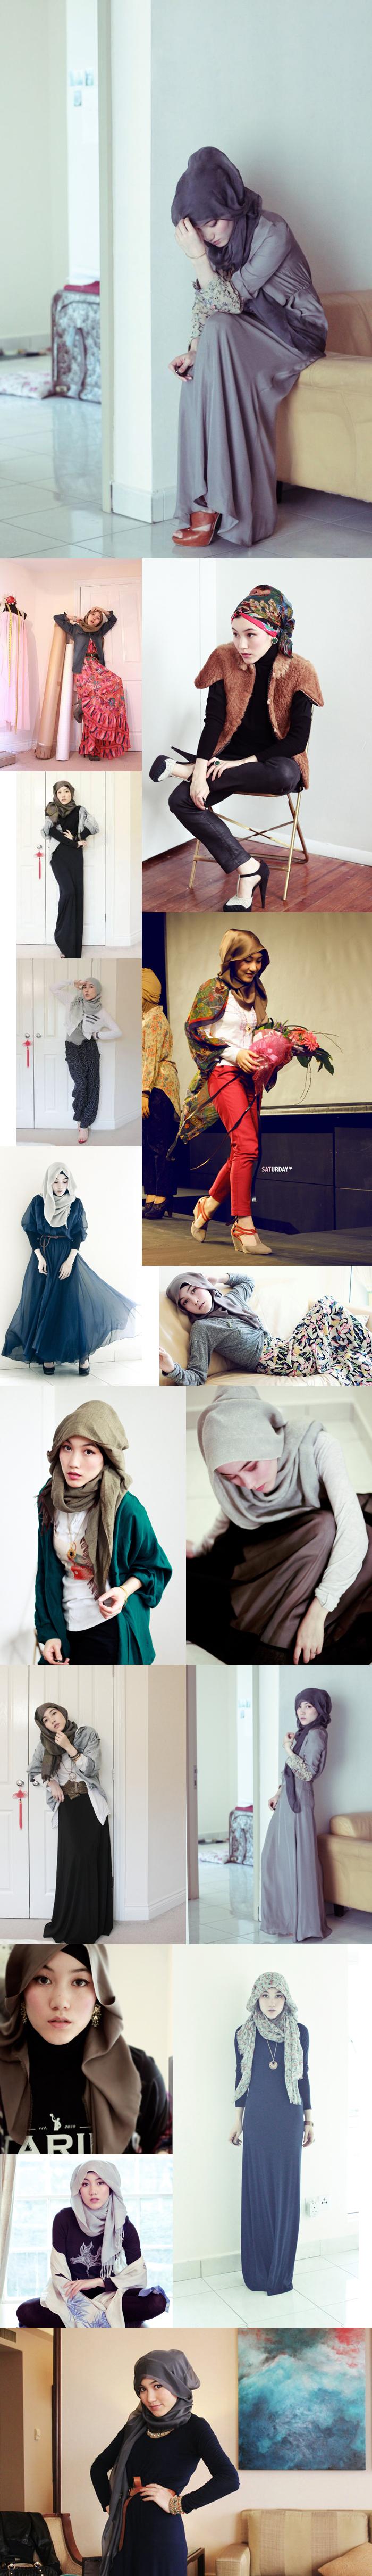 hana tajima, hijab style, her fashion, fashfaith, Muslim fashion